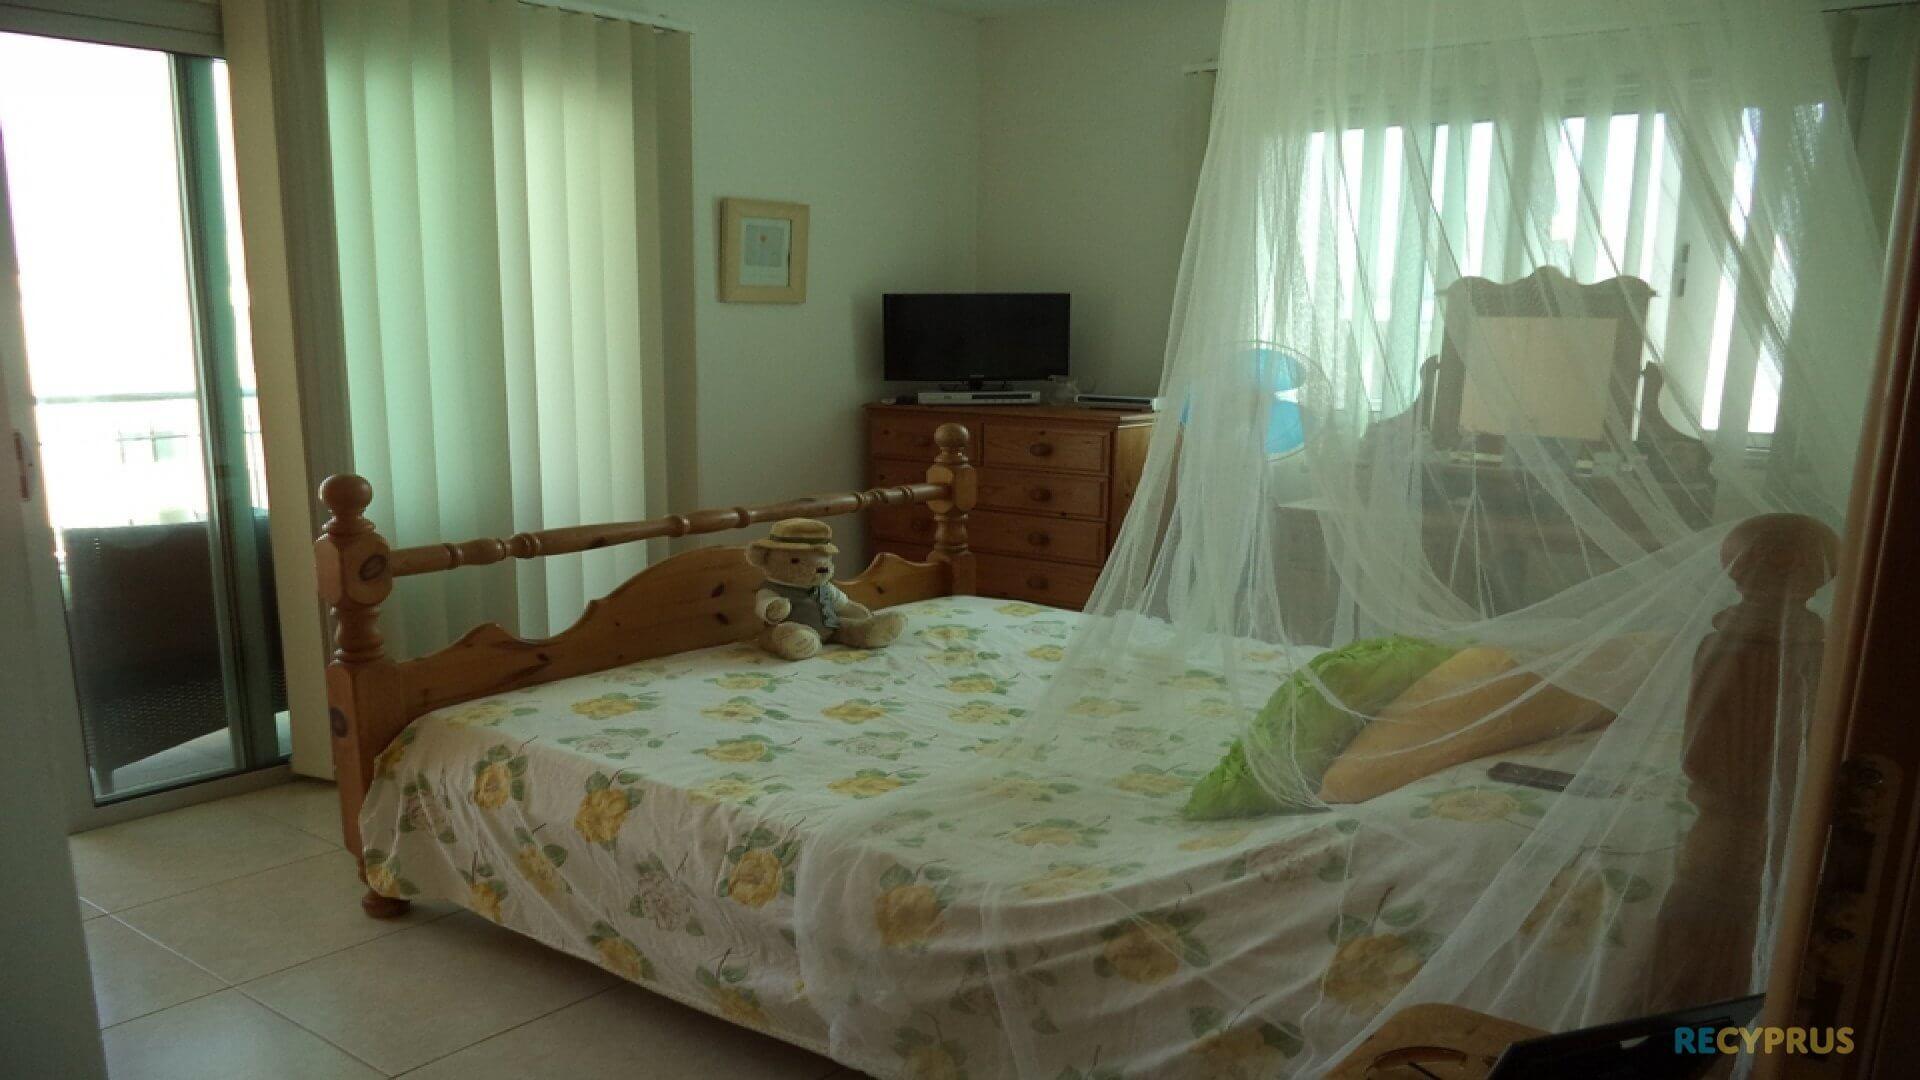 Apartment for sale Kapparis Famagusta Cyprus 6 3463